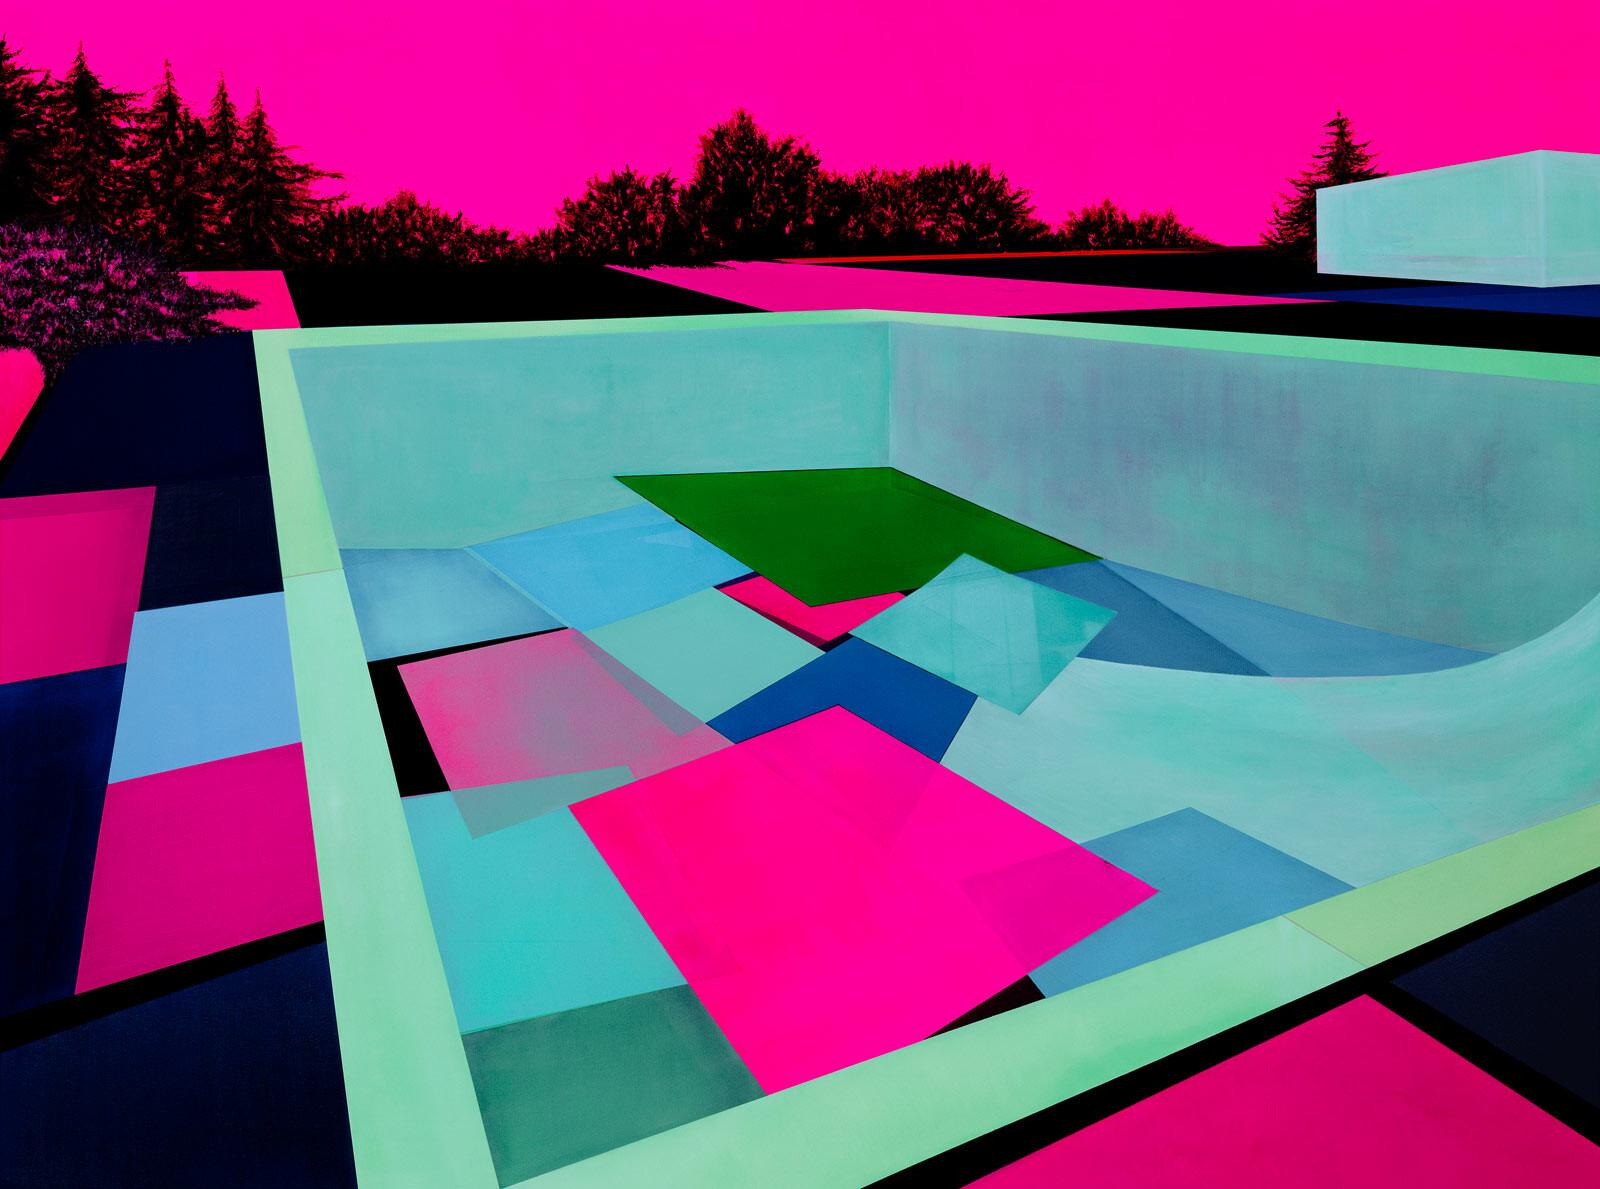 Square - Judith Lindner